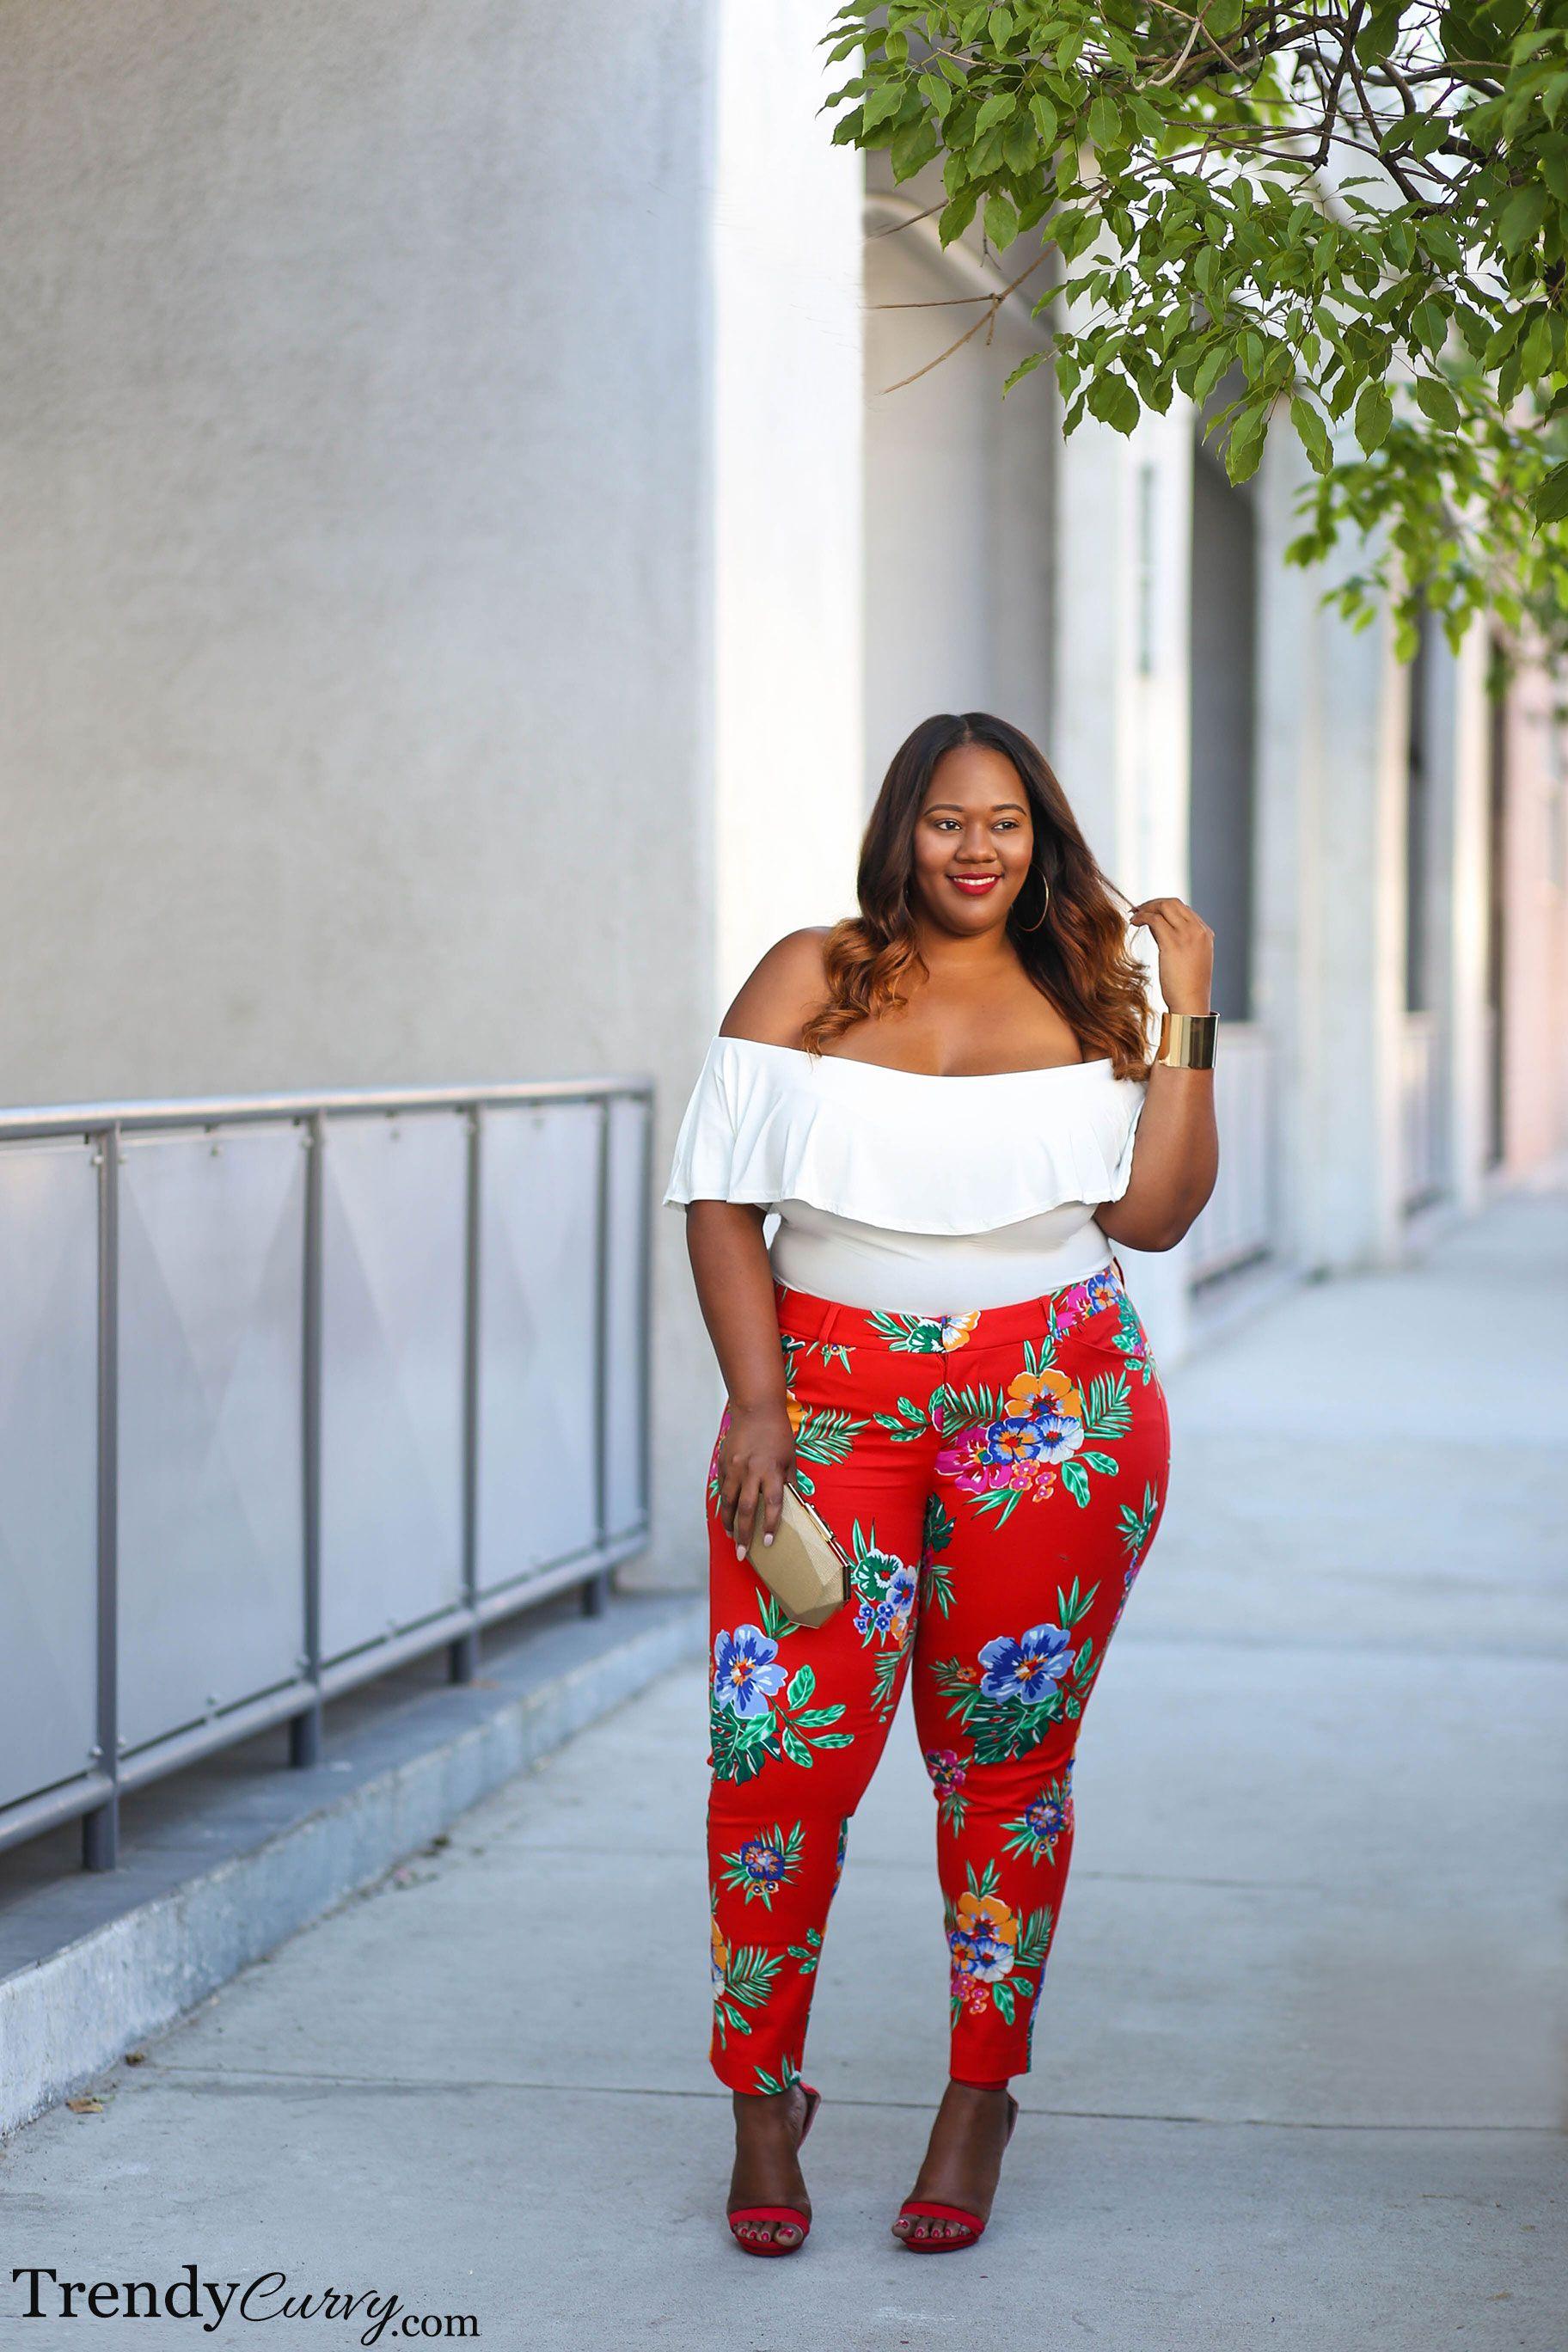 plus size fashion | bold prints | trendycurvy | curvy girls